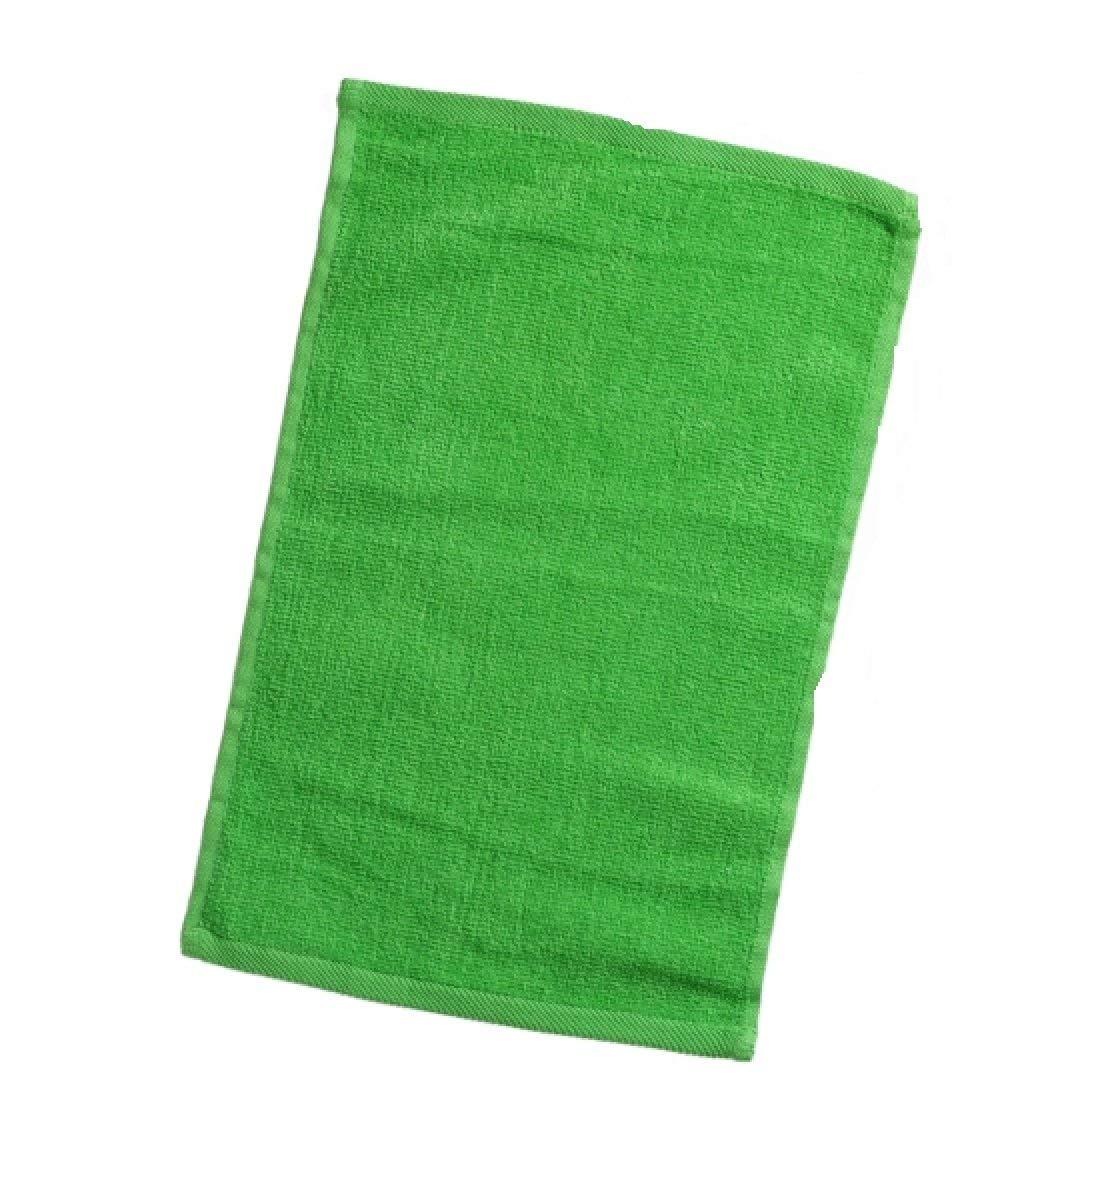 Georgiabags Wholesale Bulk Fingertip Towels, Economy Hemmed Fingertip Terry Velour Towel 11in x 18in, 100% Cotton (240, Lime)